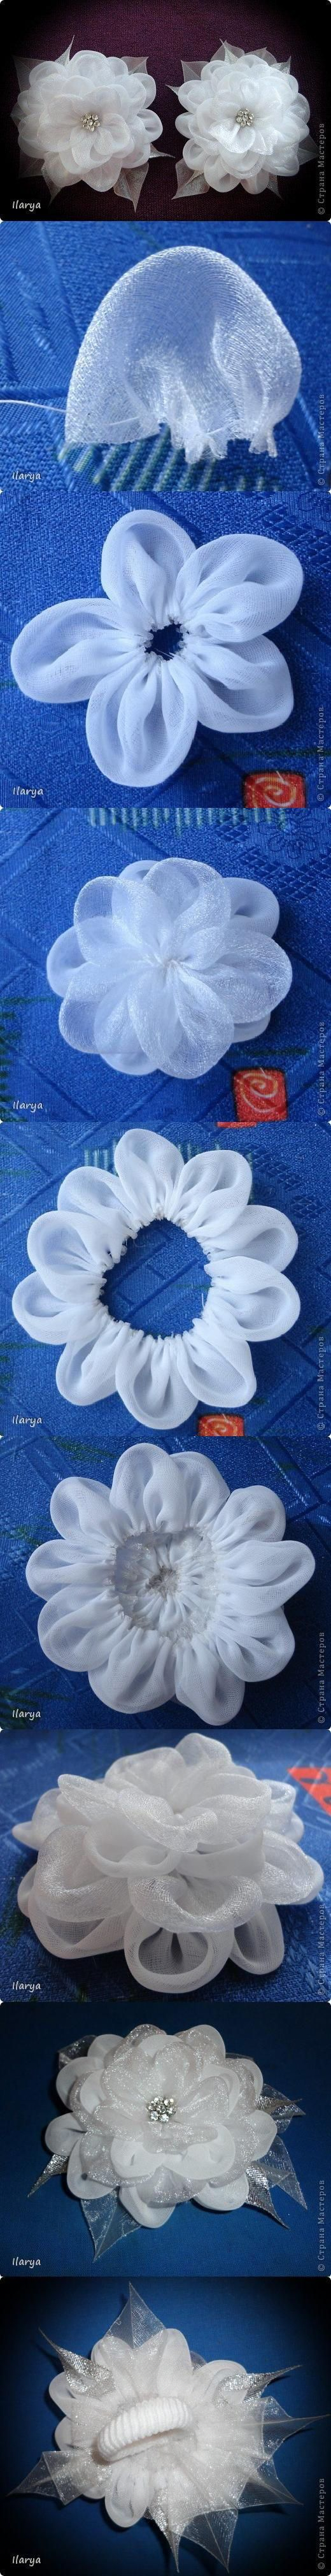 DIY Fabric Lust Flower